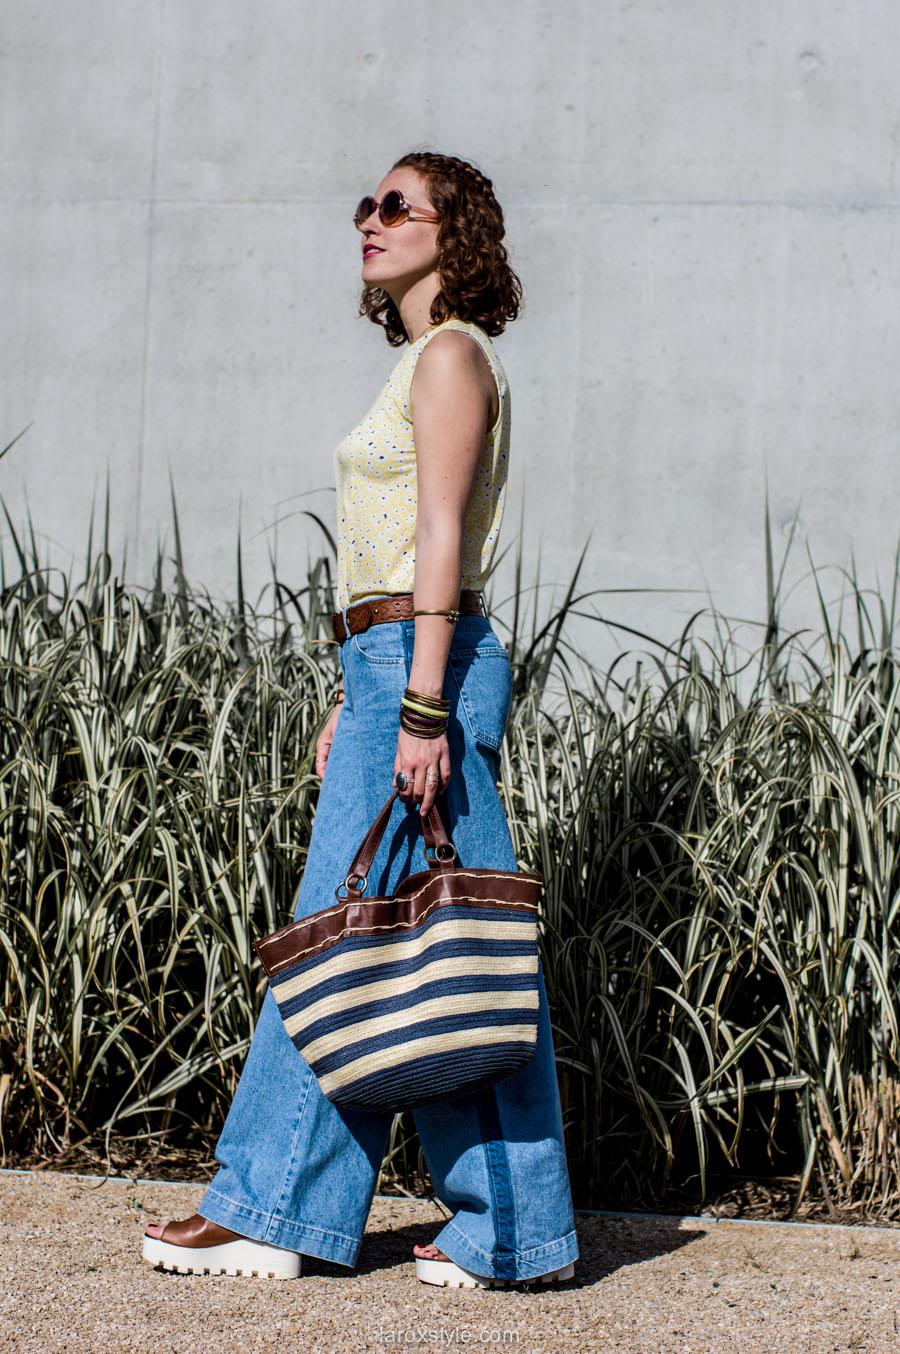 laroxstyle - blog mode lyon - look 70s - pantalon patte d elephant (12 sur 44)